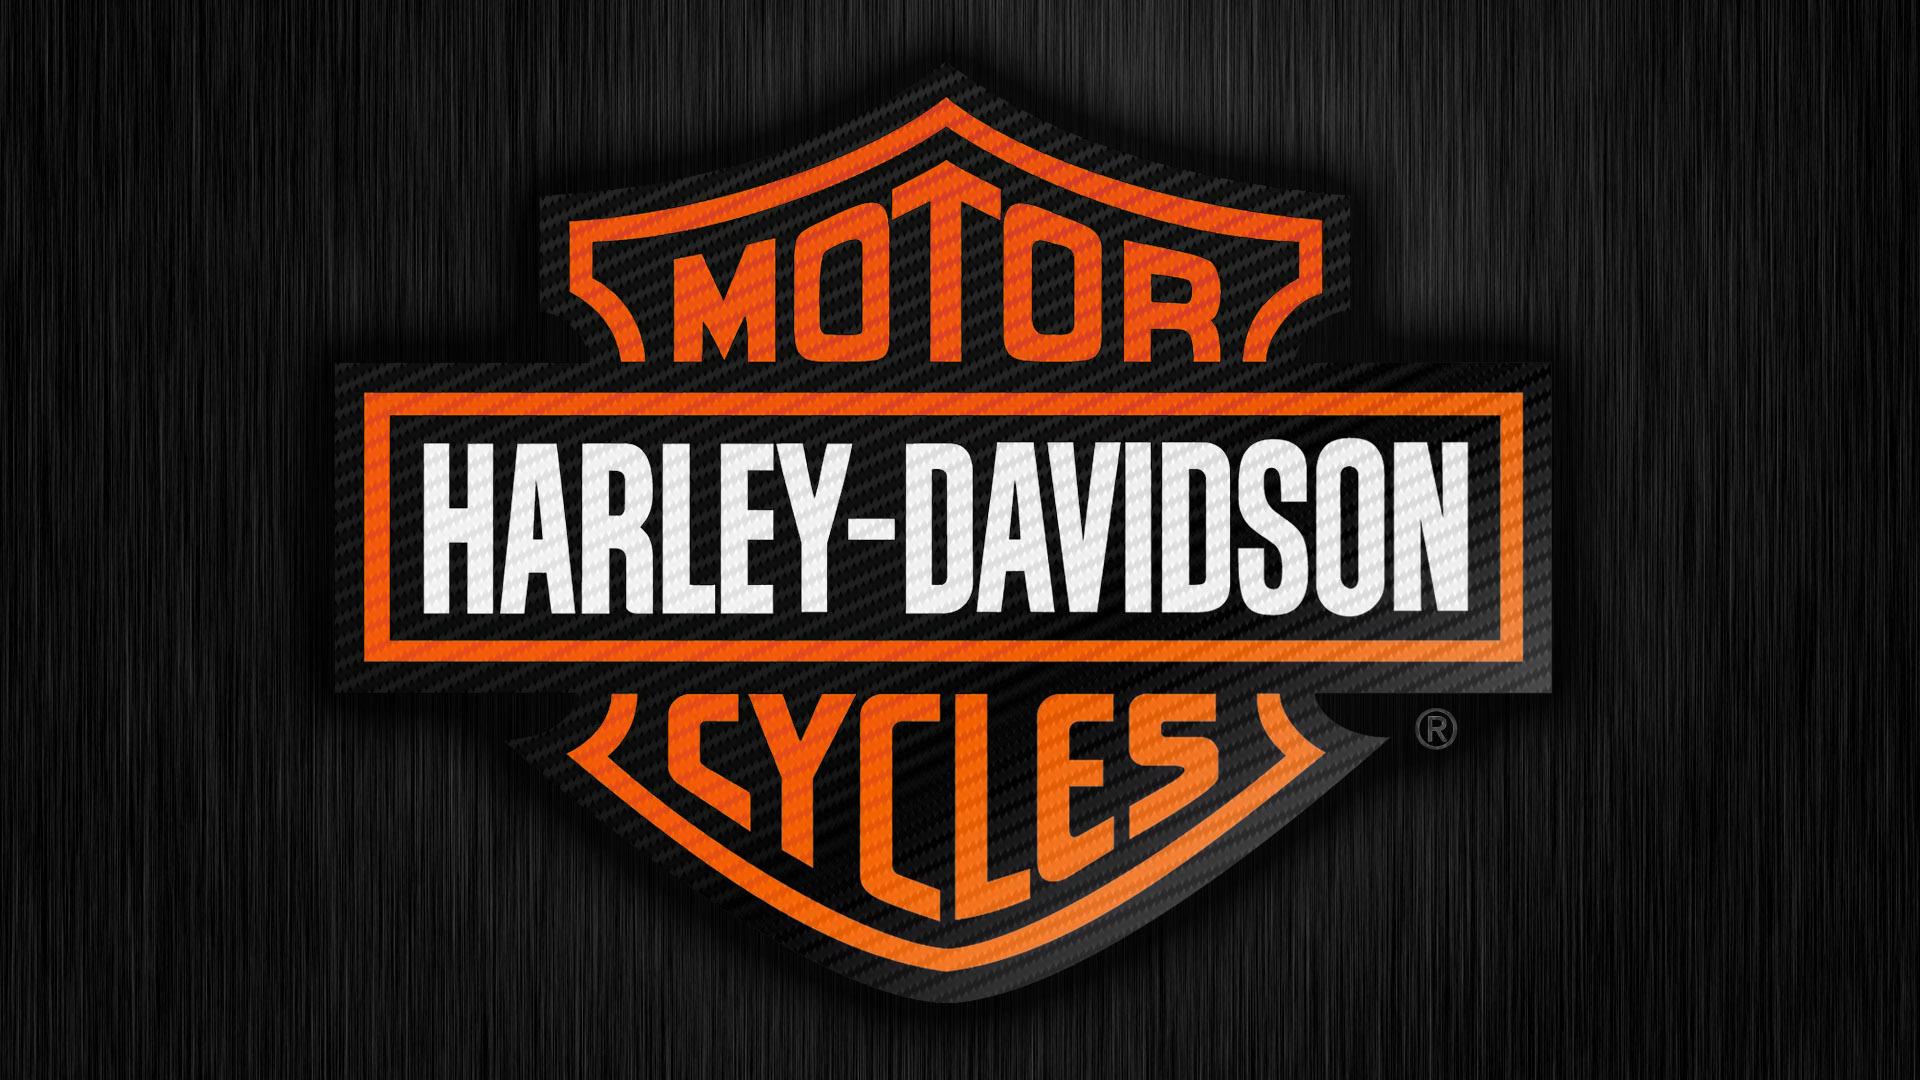 Harley Davidson Logo - Harley Davidson Logo